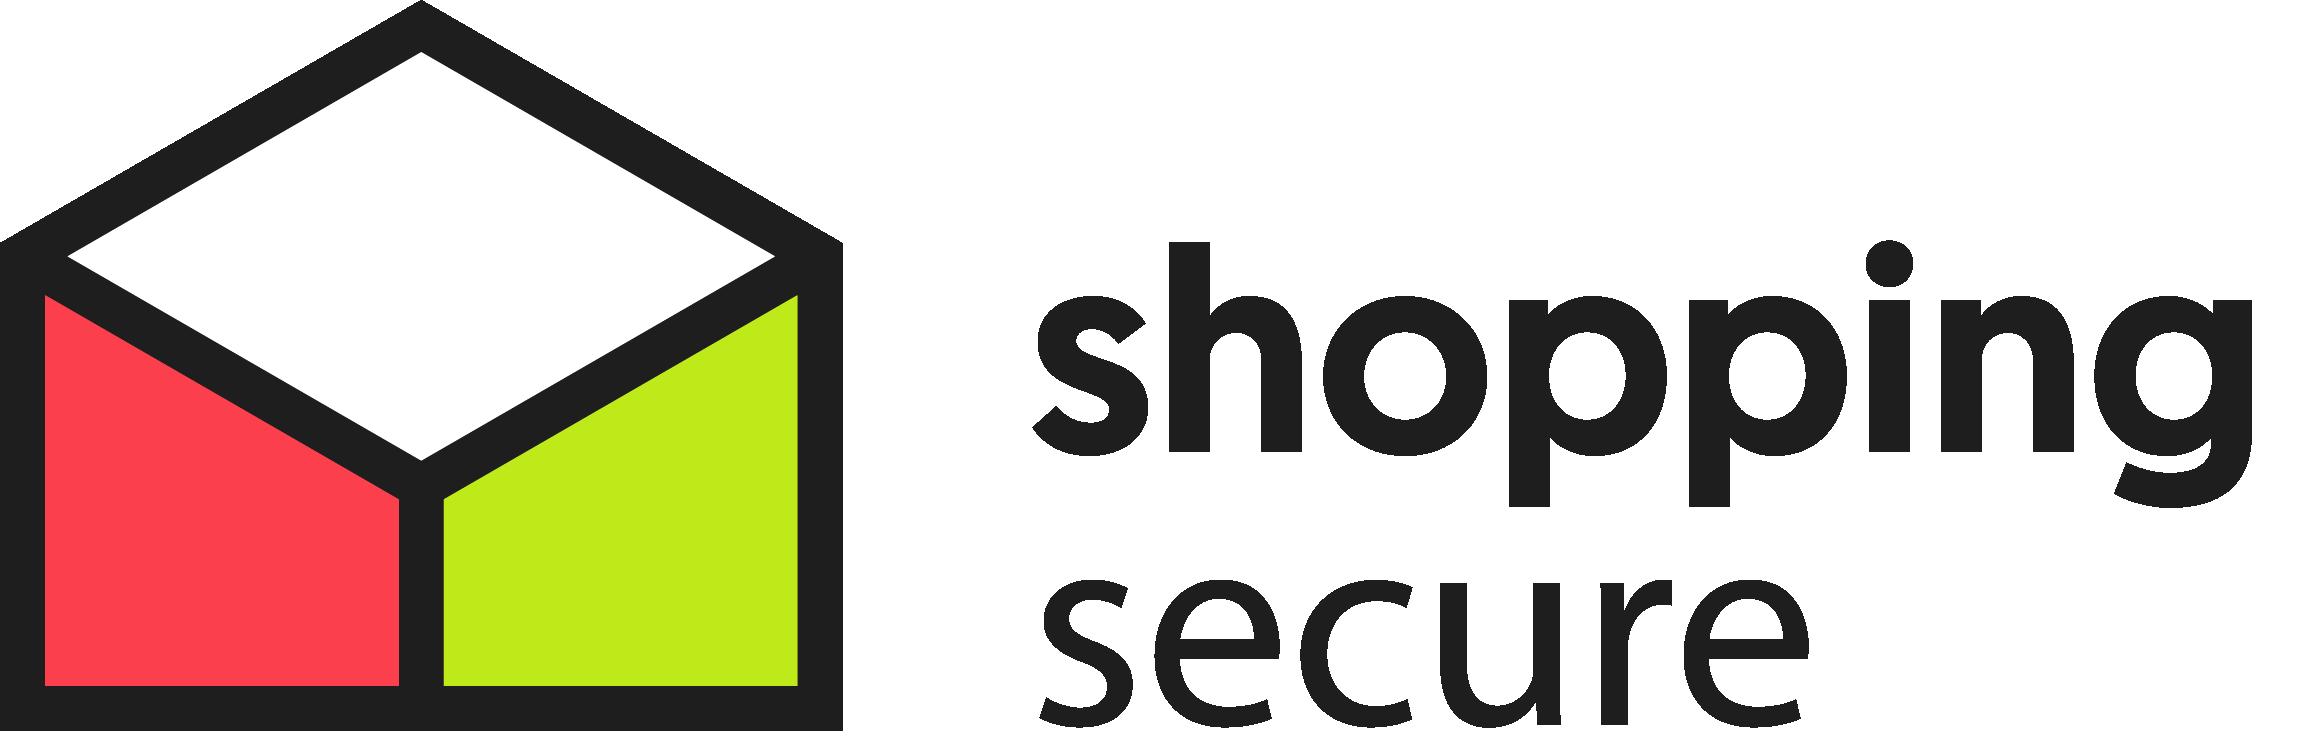 Shopping_Secure_Horizontaal_Kleur